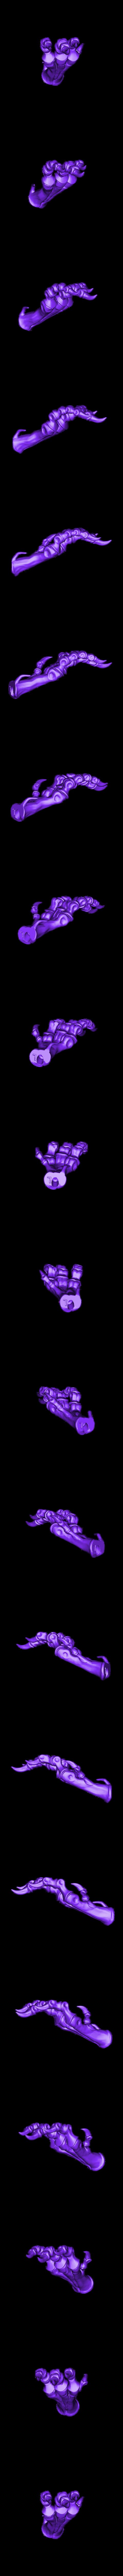 TRex_Feet_1.stl Download free STL file T-Rex Skeleton - Leo Burton Mount • 3D printing design, HarryHistory